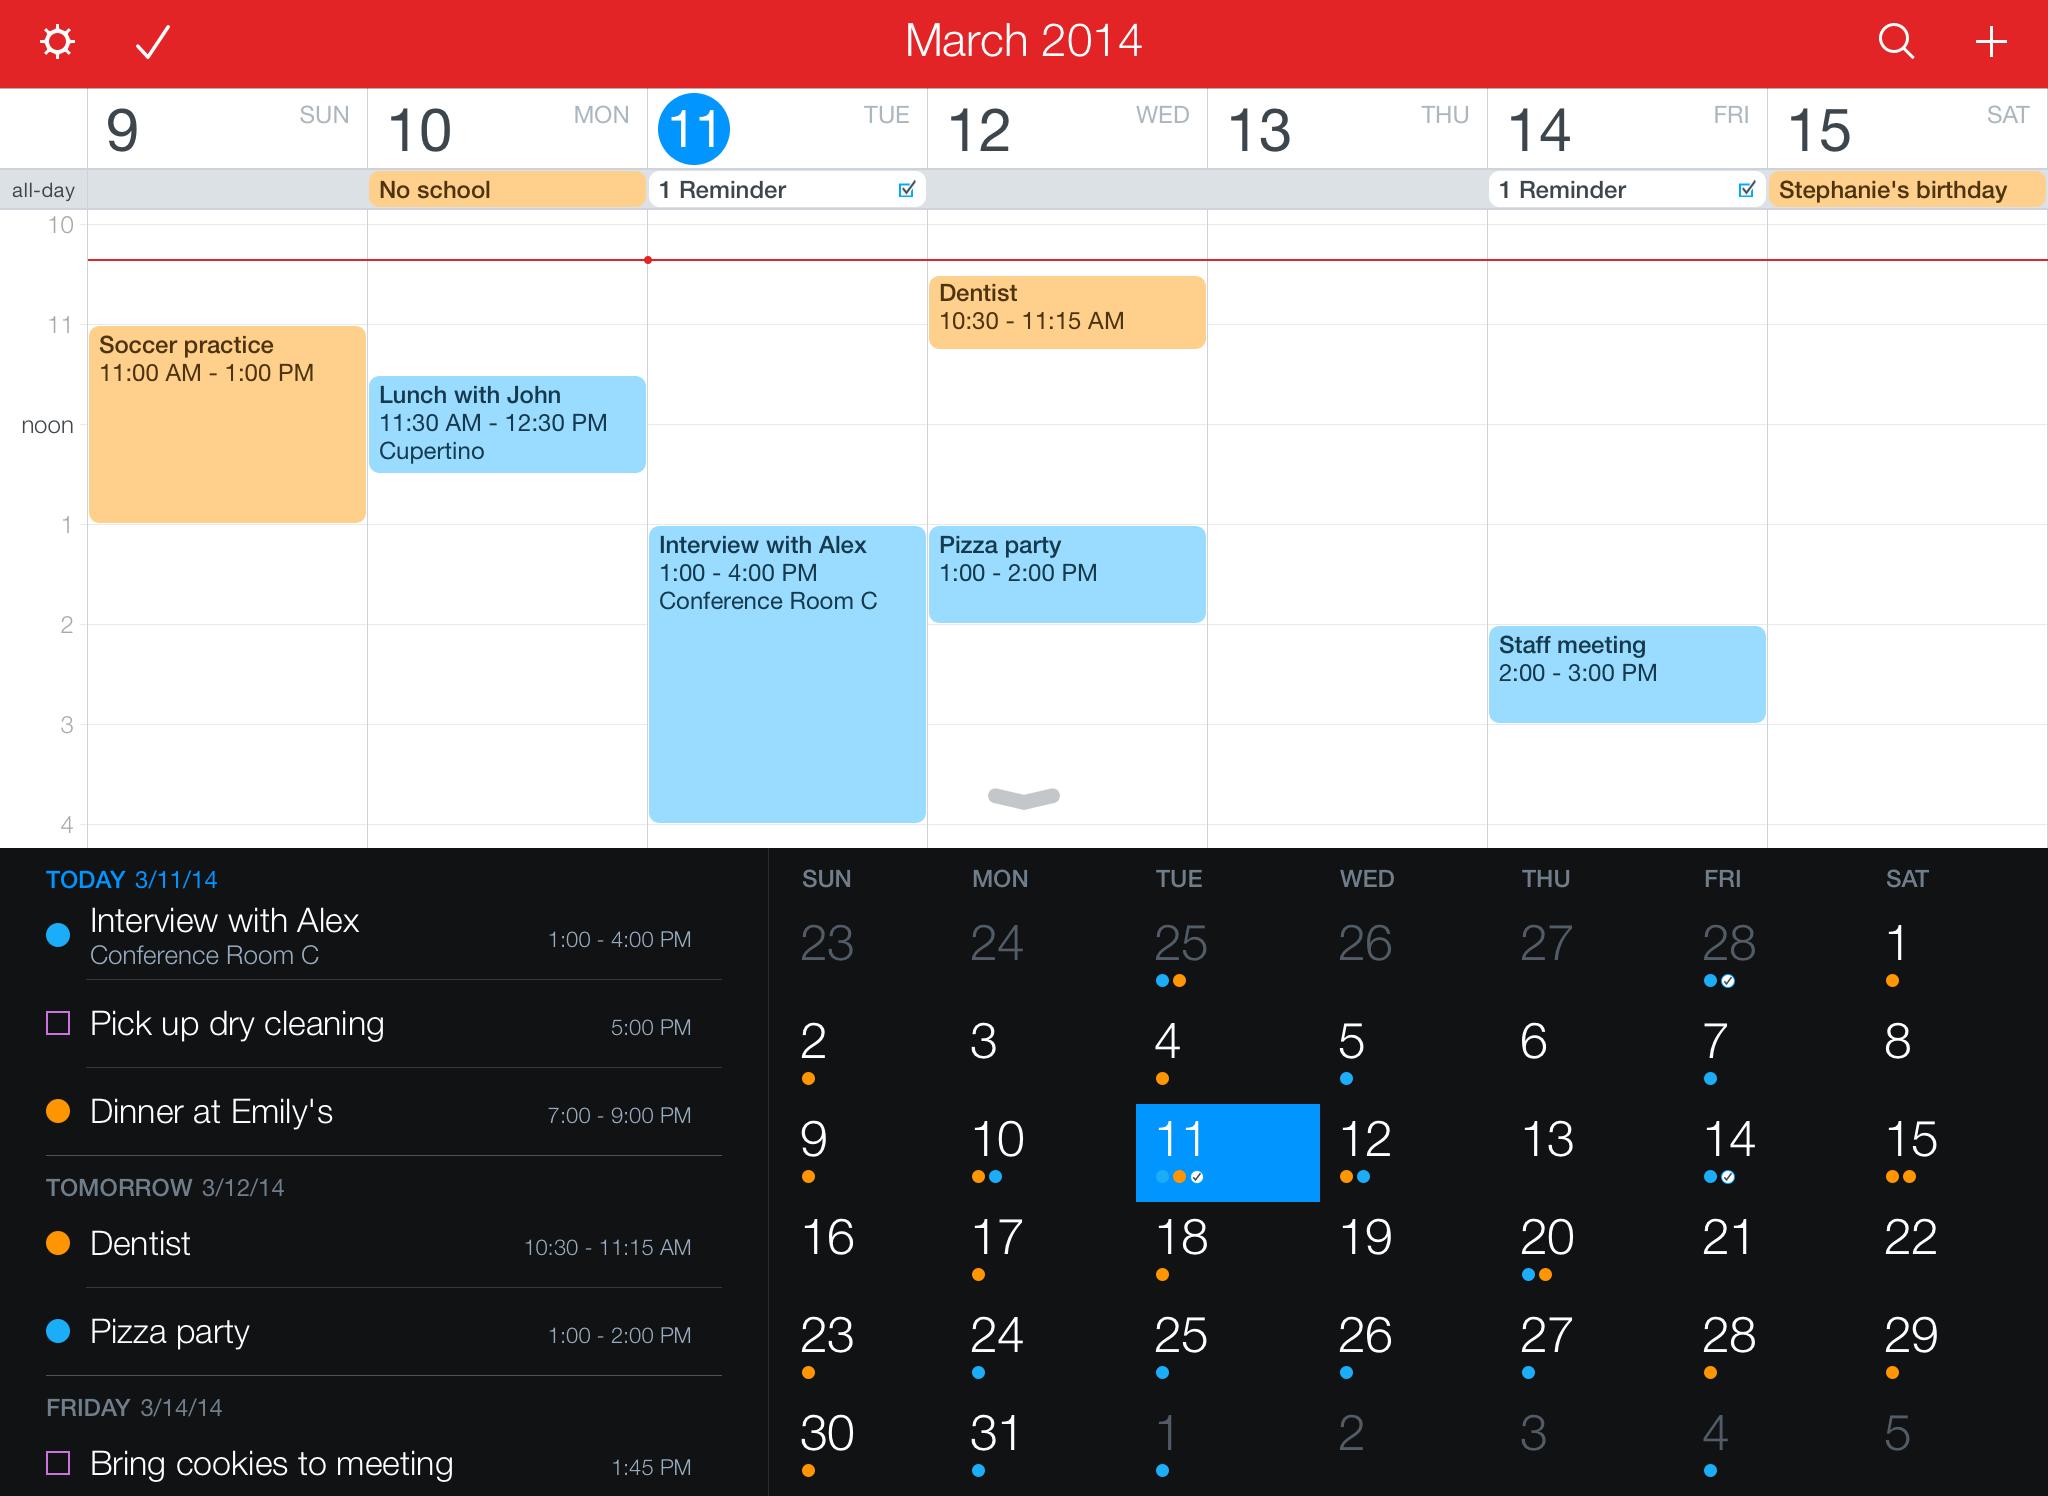 screenshot-2-weekview.png